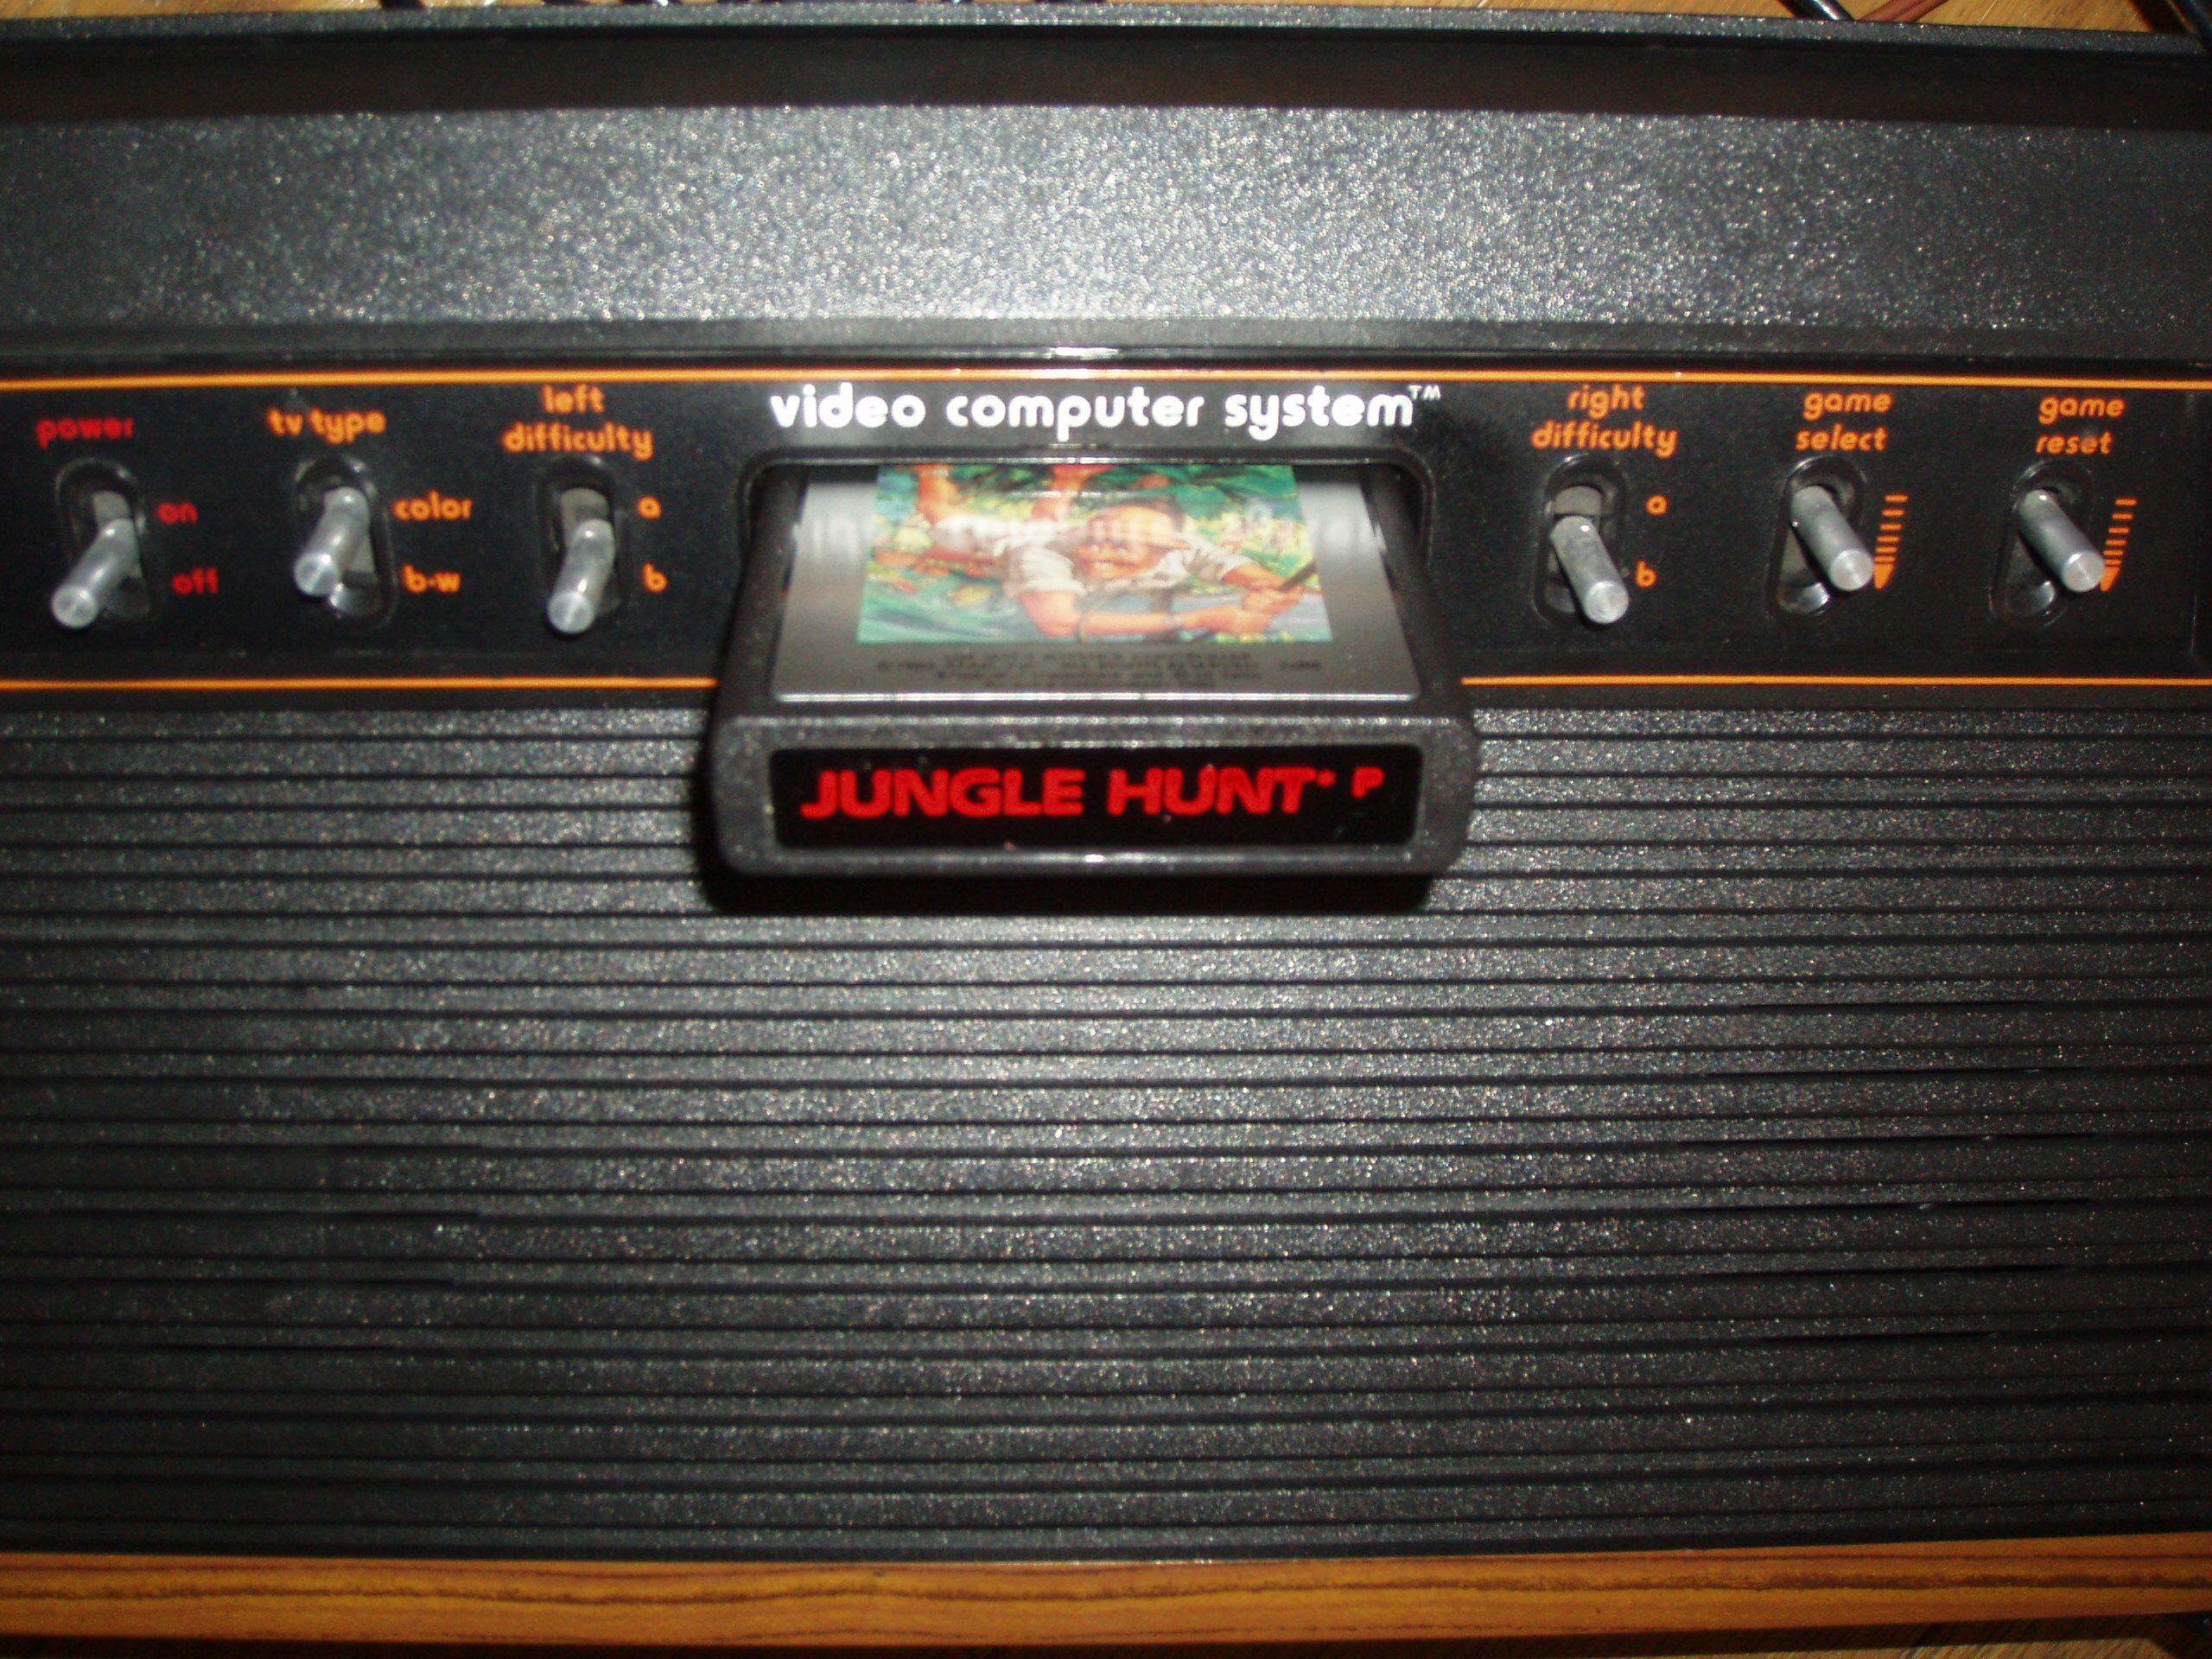 atari2600forever: Jungle Hunt: Game 2 (Atari 2600) 20,420 points on 2019-03-15 07:00:05